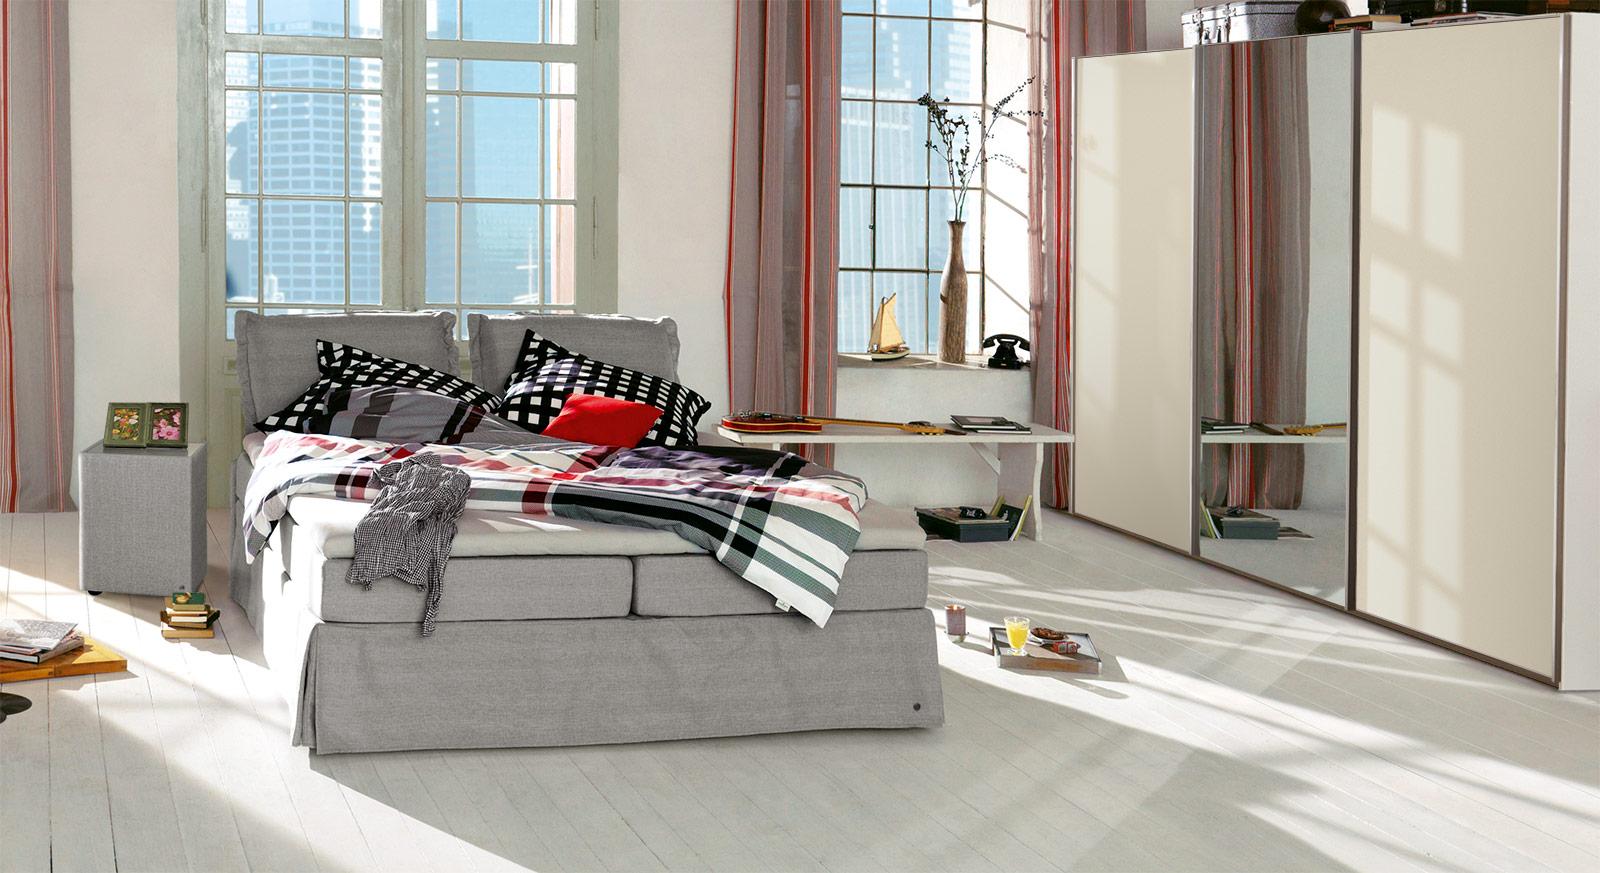 Unifarbenes Boxspringbett Tom Tailor Cushion mit passenden Produkten